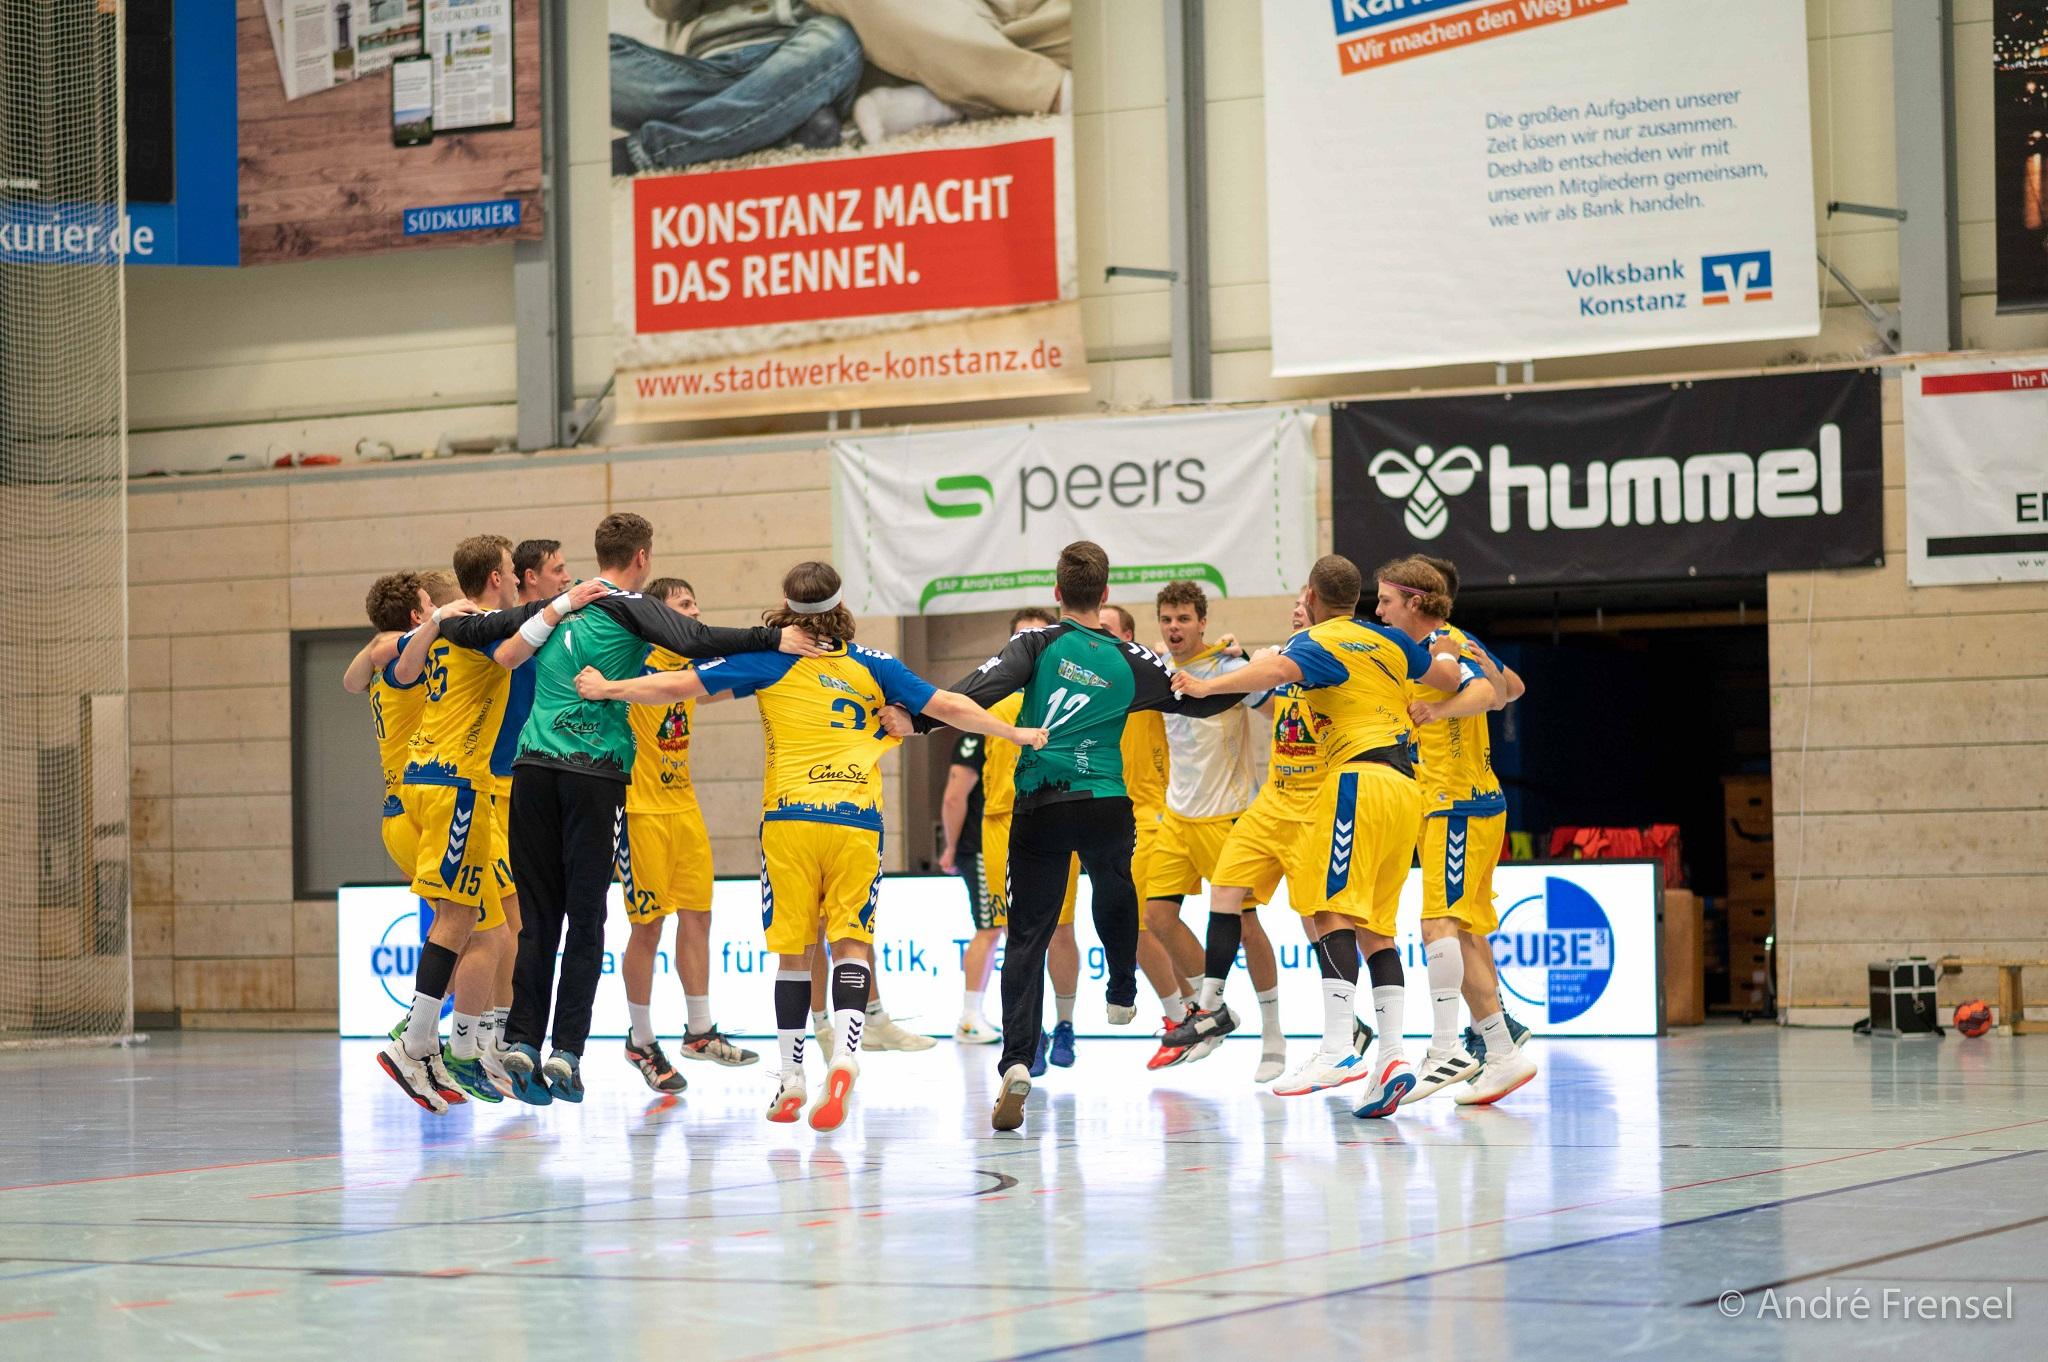 """Reaktion sensationell"": U23 der HSG Konstanz mit furiosem Comeback nach Sechs-Tore-Rückstand"